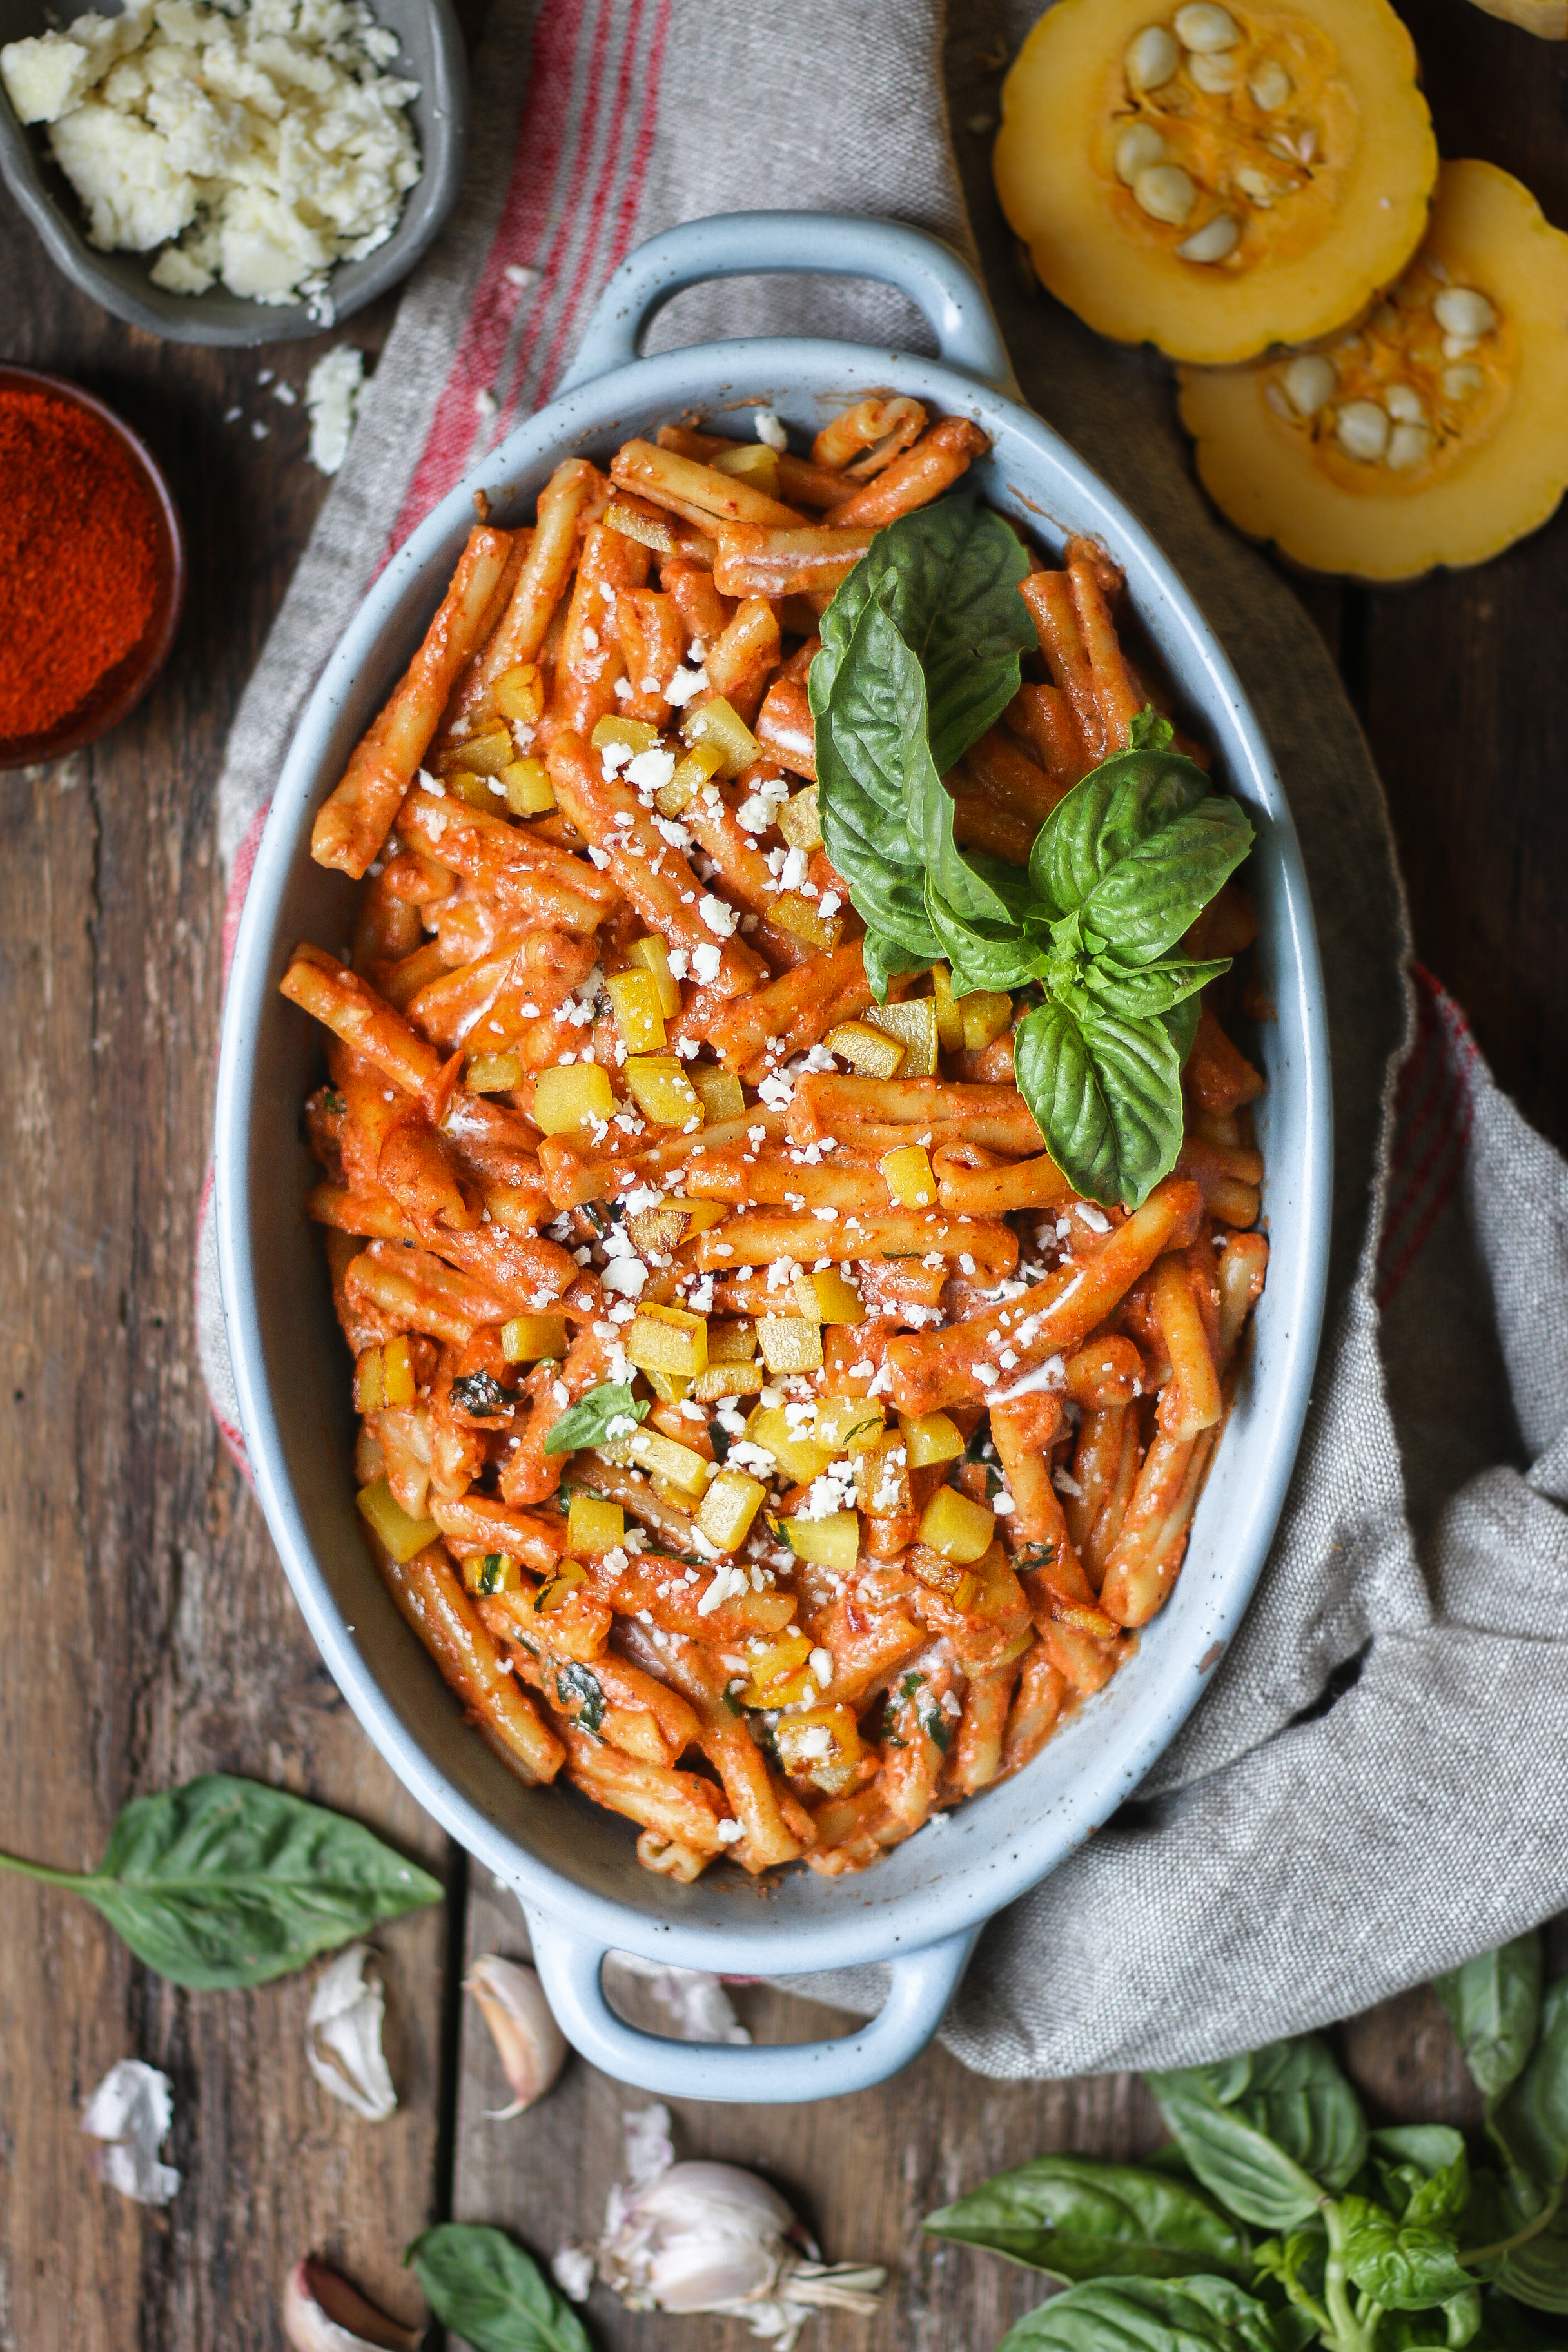 Cajun Spiced Pumpkin Pasta with Creamy Tomato Sauce |foodfashionparty| #pumpkinpasta #cajunpasta